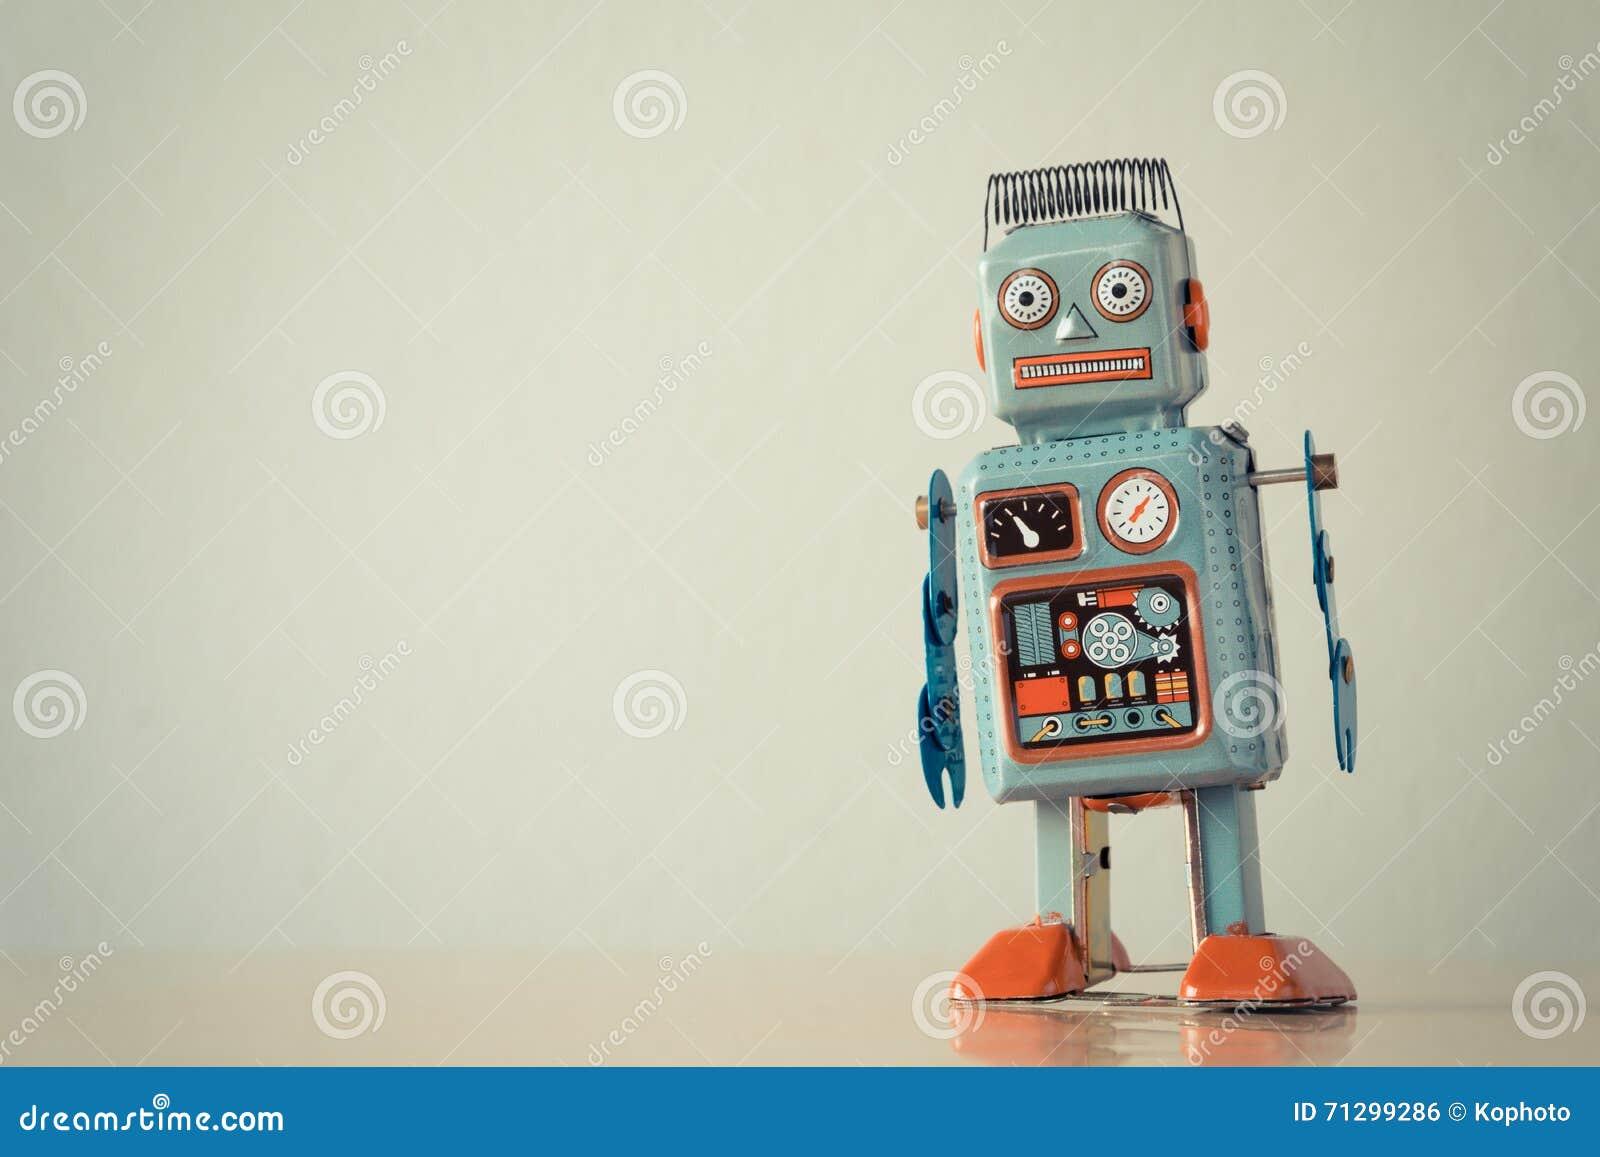 Download Vintage tin toy robot stock photo. Image of childhood - 71299286